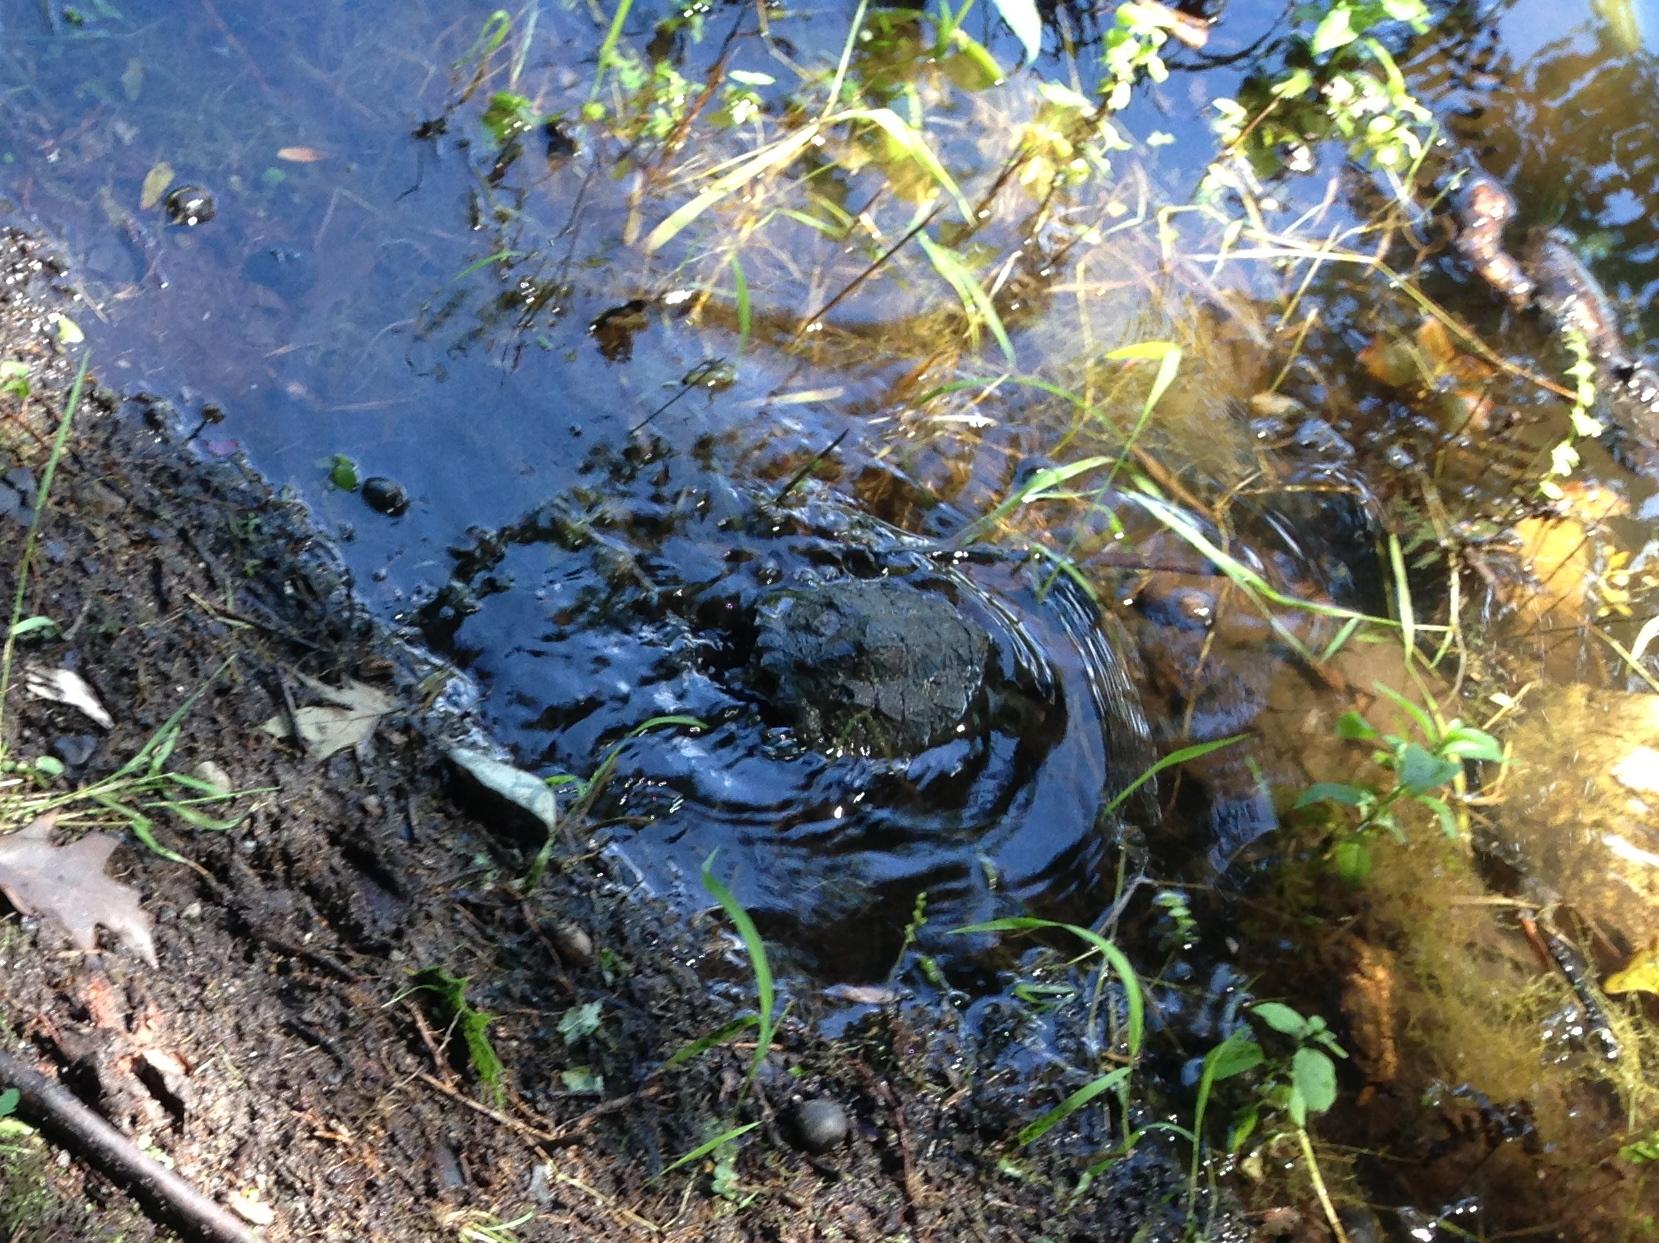 backyard wildlife more turtle stuff tumblehome learning science